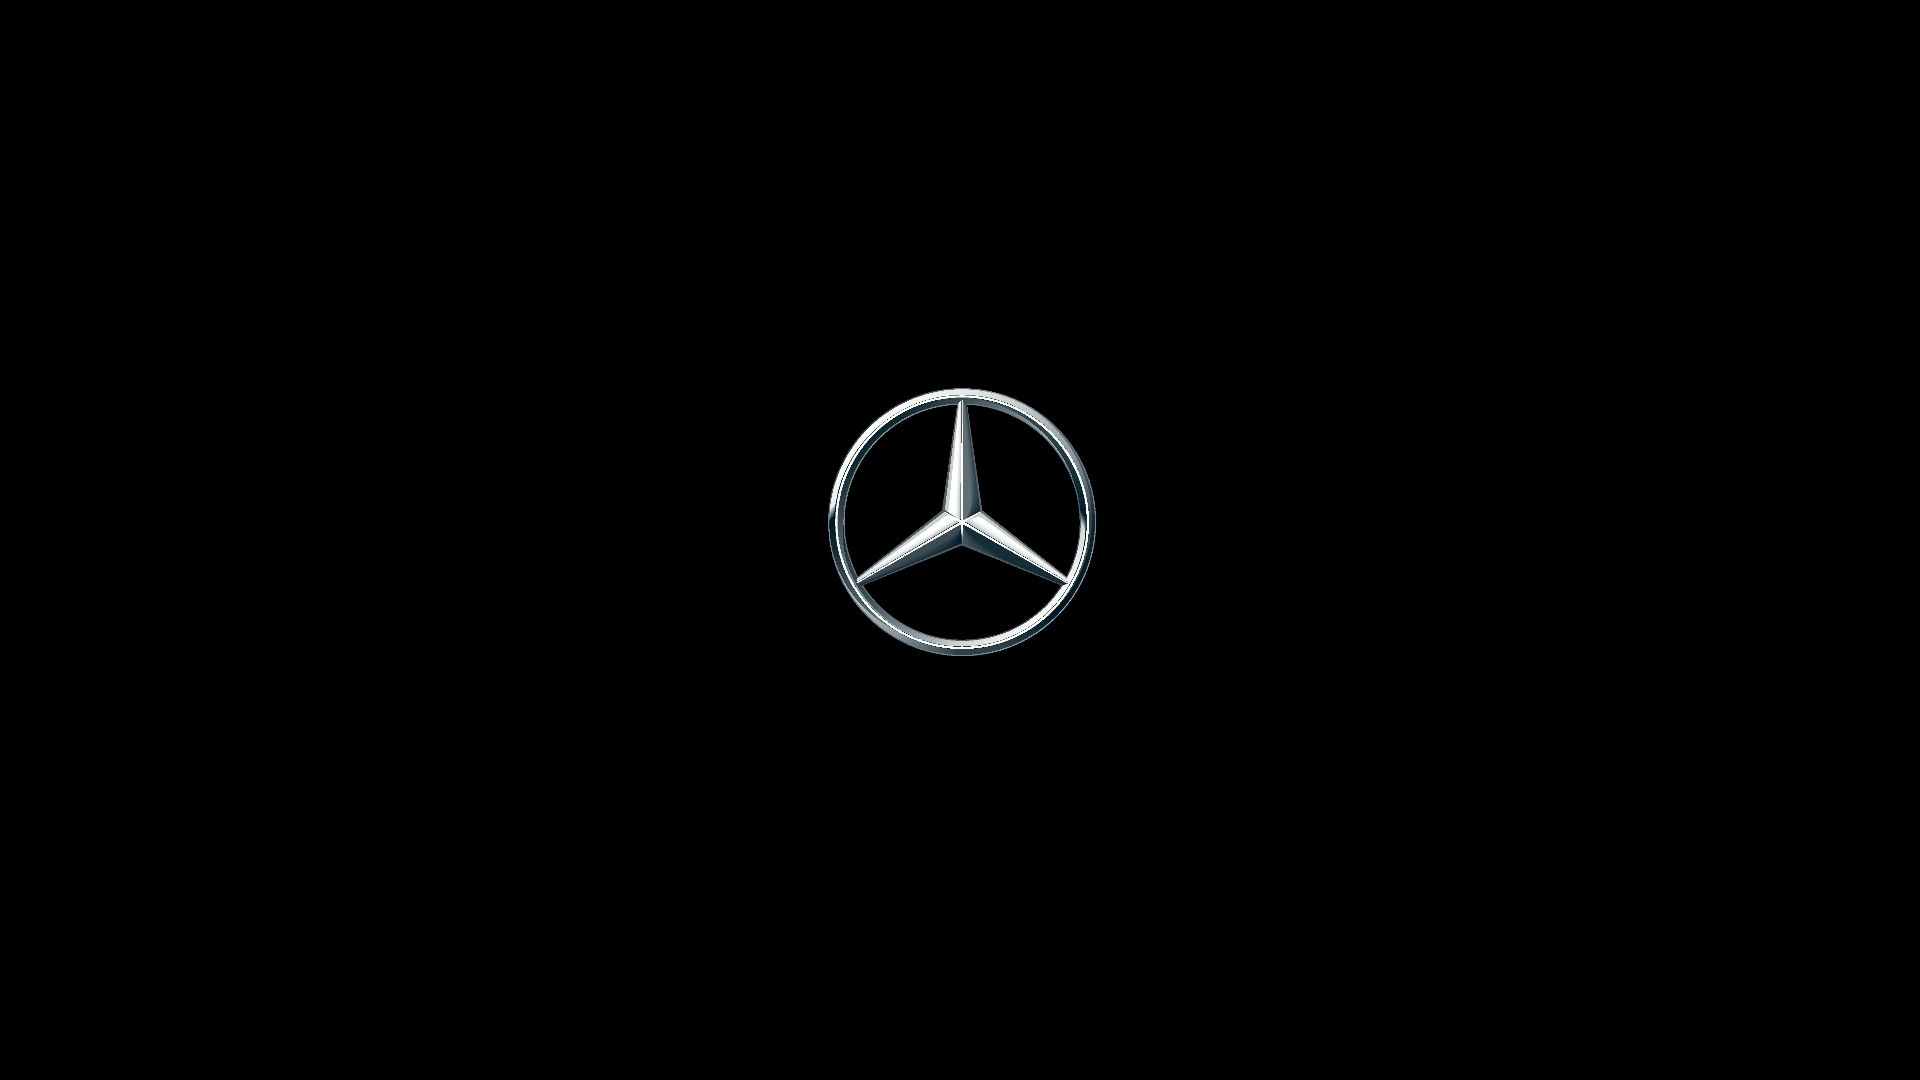 10 Top Mercedes Benz Logo Wallpapers Full Hd 1080p For Pc Background Mercedes Logo Mercedes Benz Logo Mercedes Benz Wallpaper